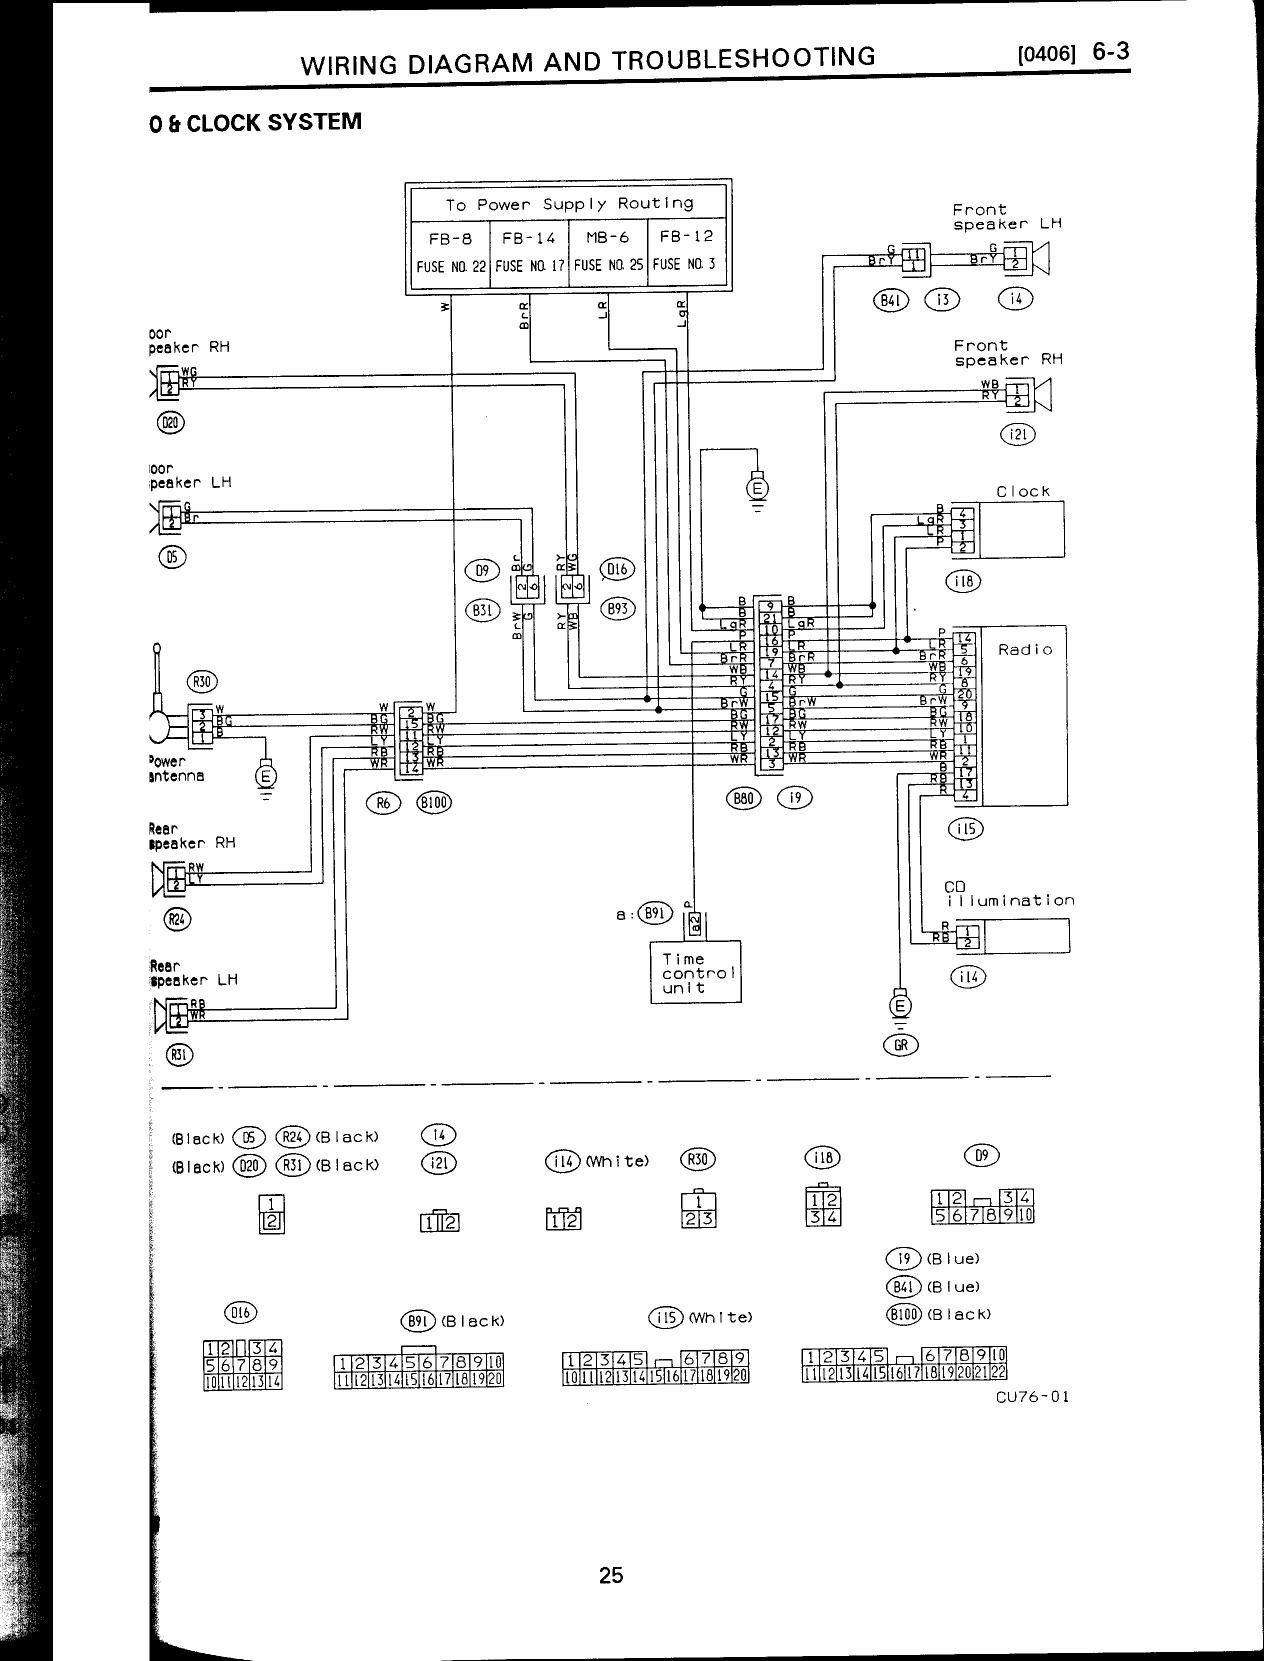 Subaru Legacy Engine Diagram 2 Subaru Wiring Diagrams Blurts Of Subaru Legacy Engine Diagram 2